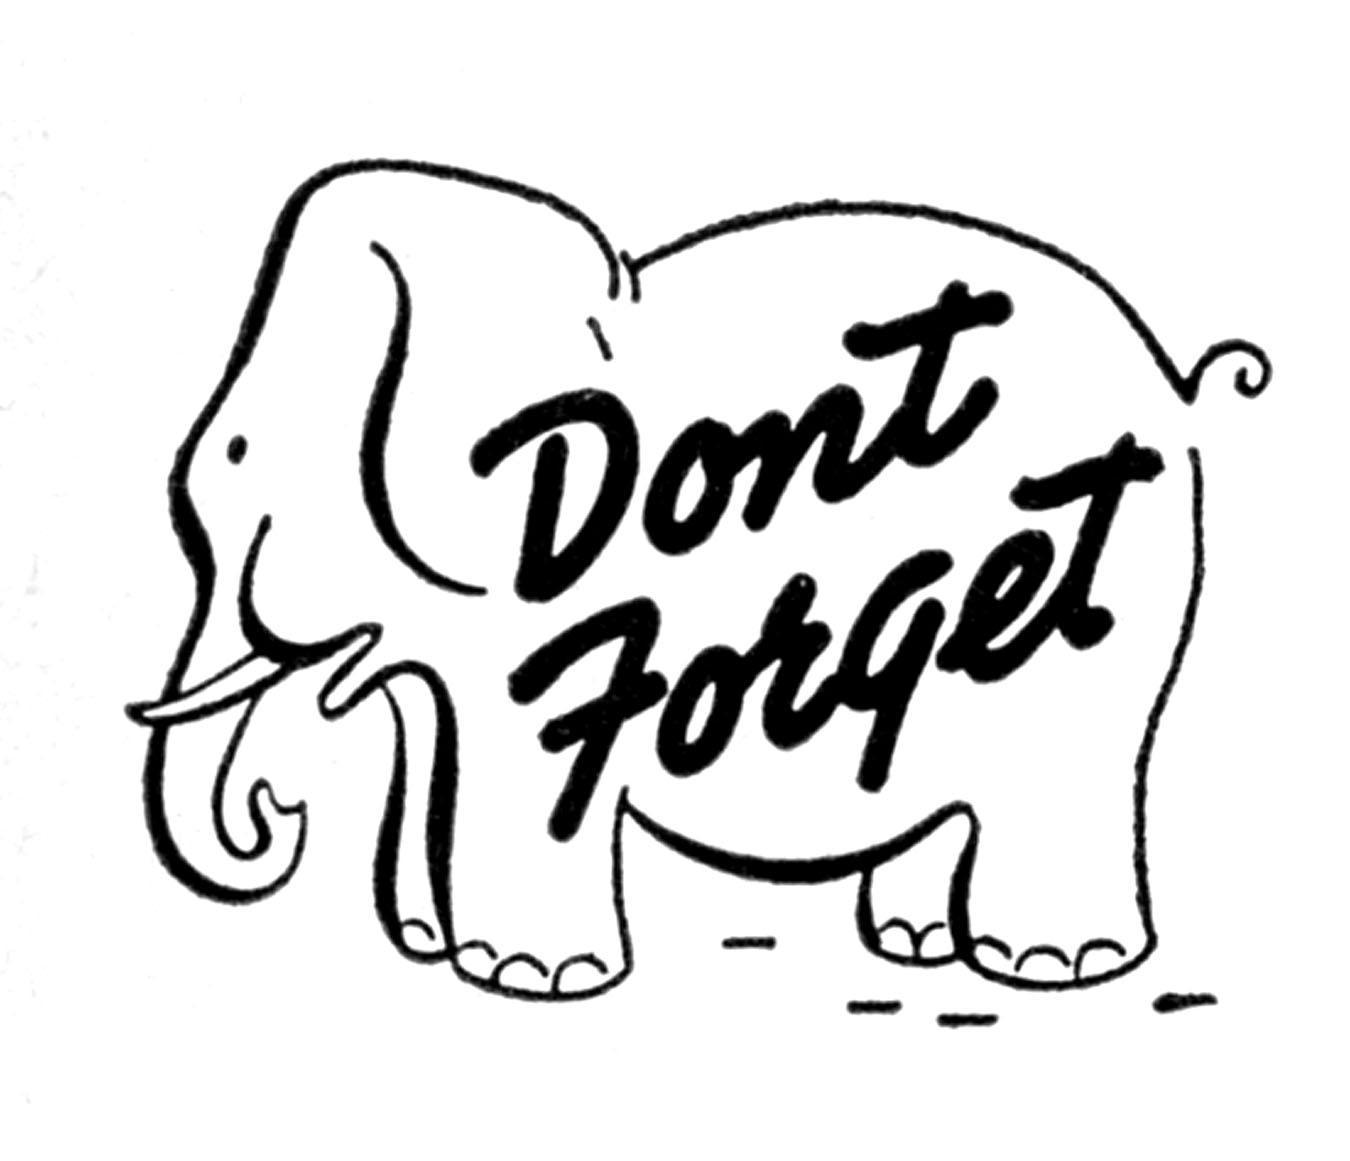 Reminder Clip Art Free Retro Reminder Symbols Lucketts